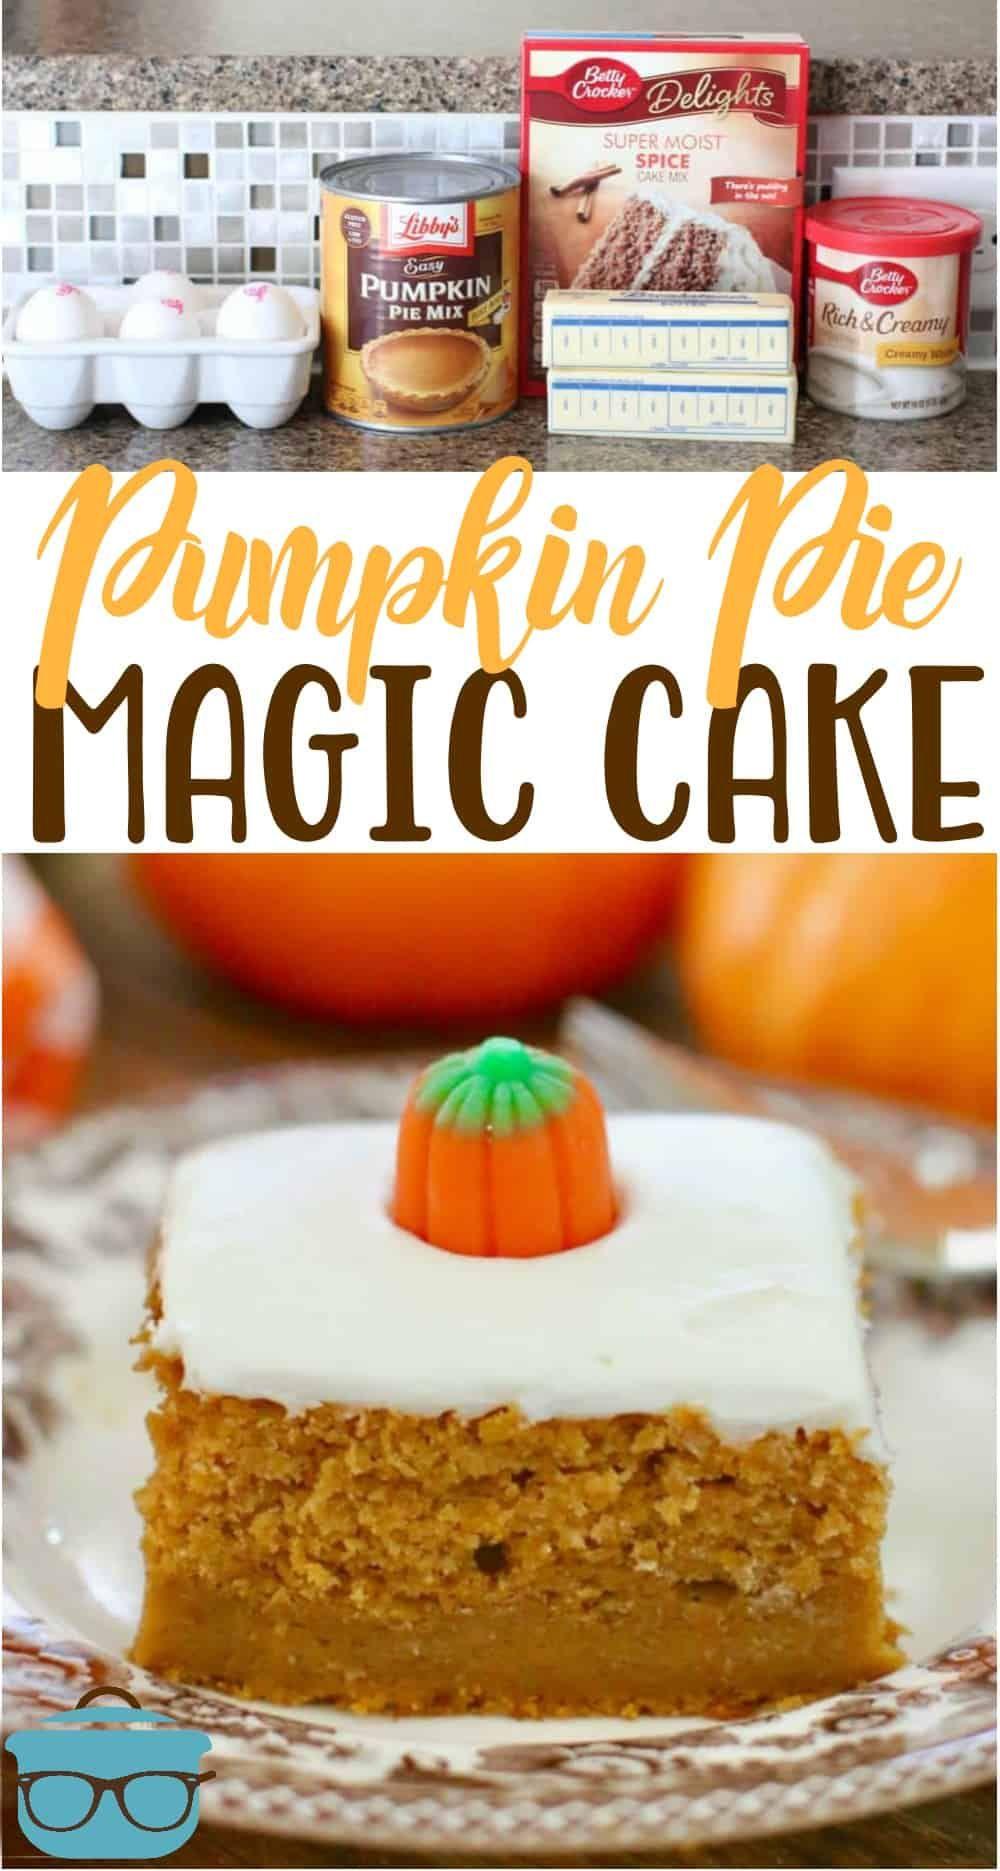 Pumpkin pie magic cake #frostings